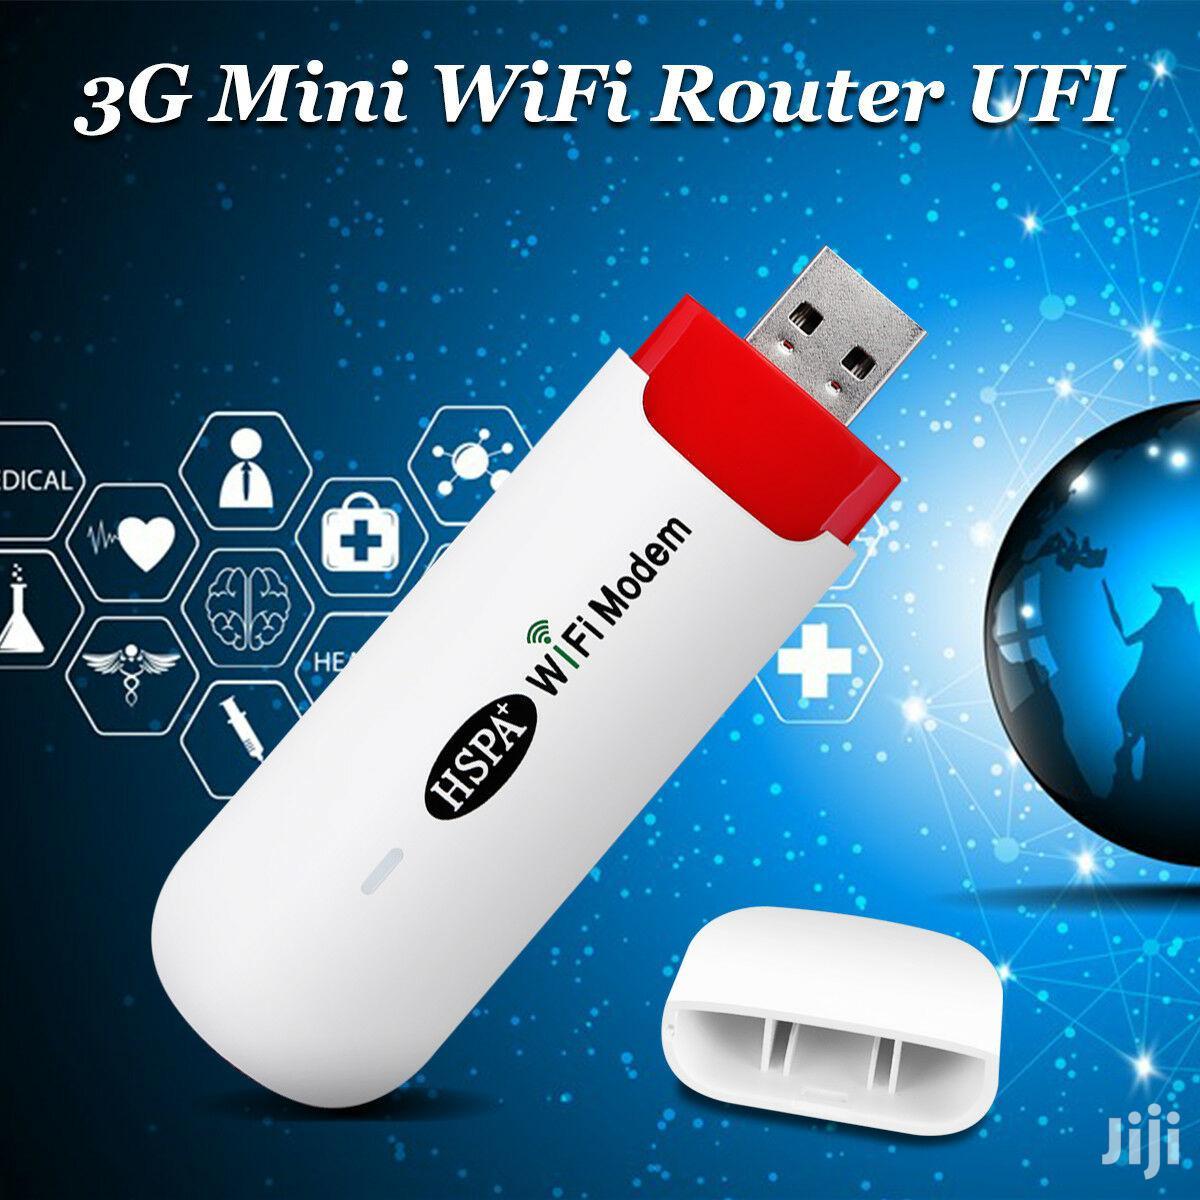 HSPA Modem 3G Mobile Router